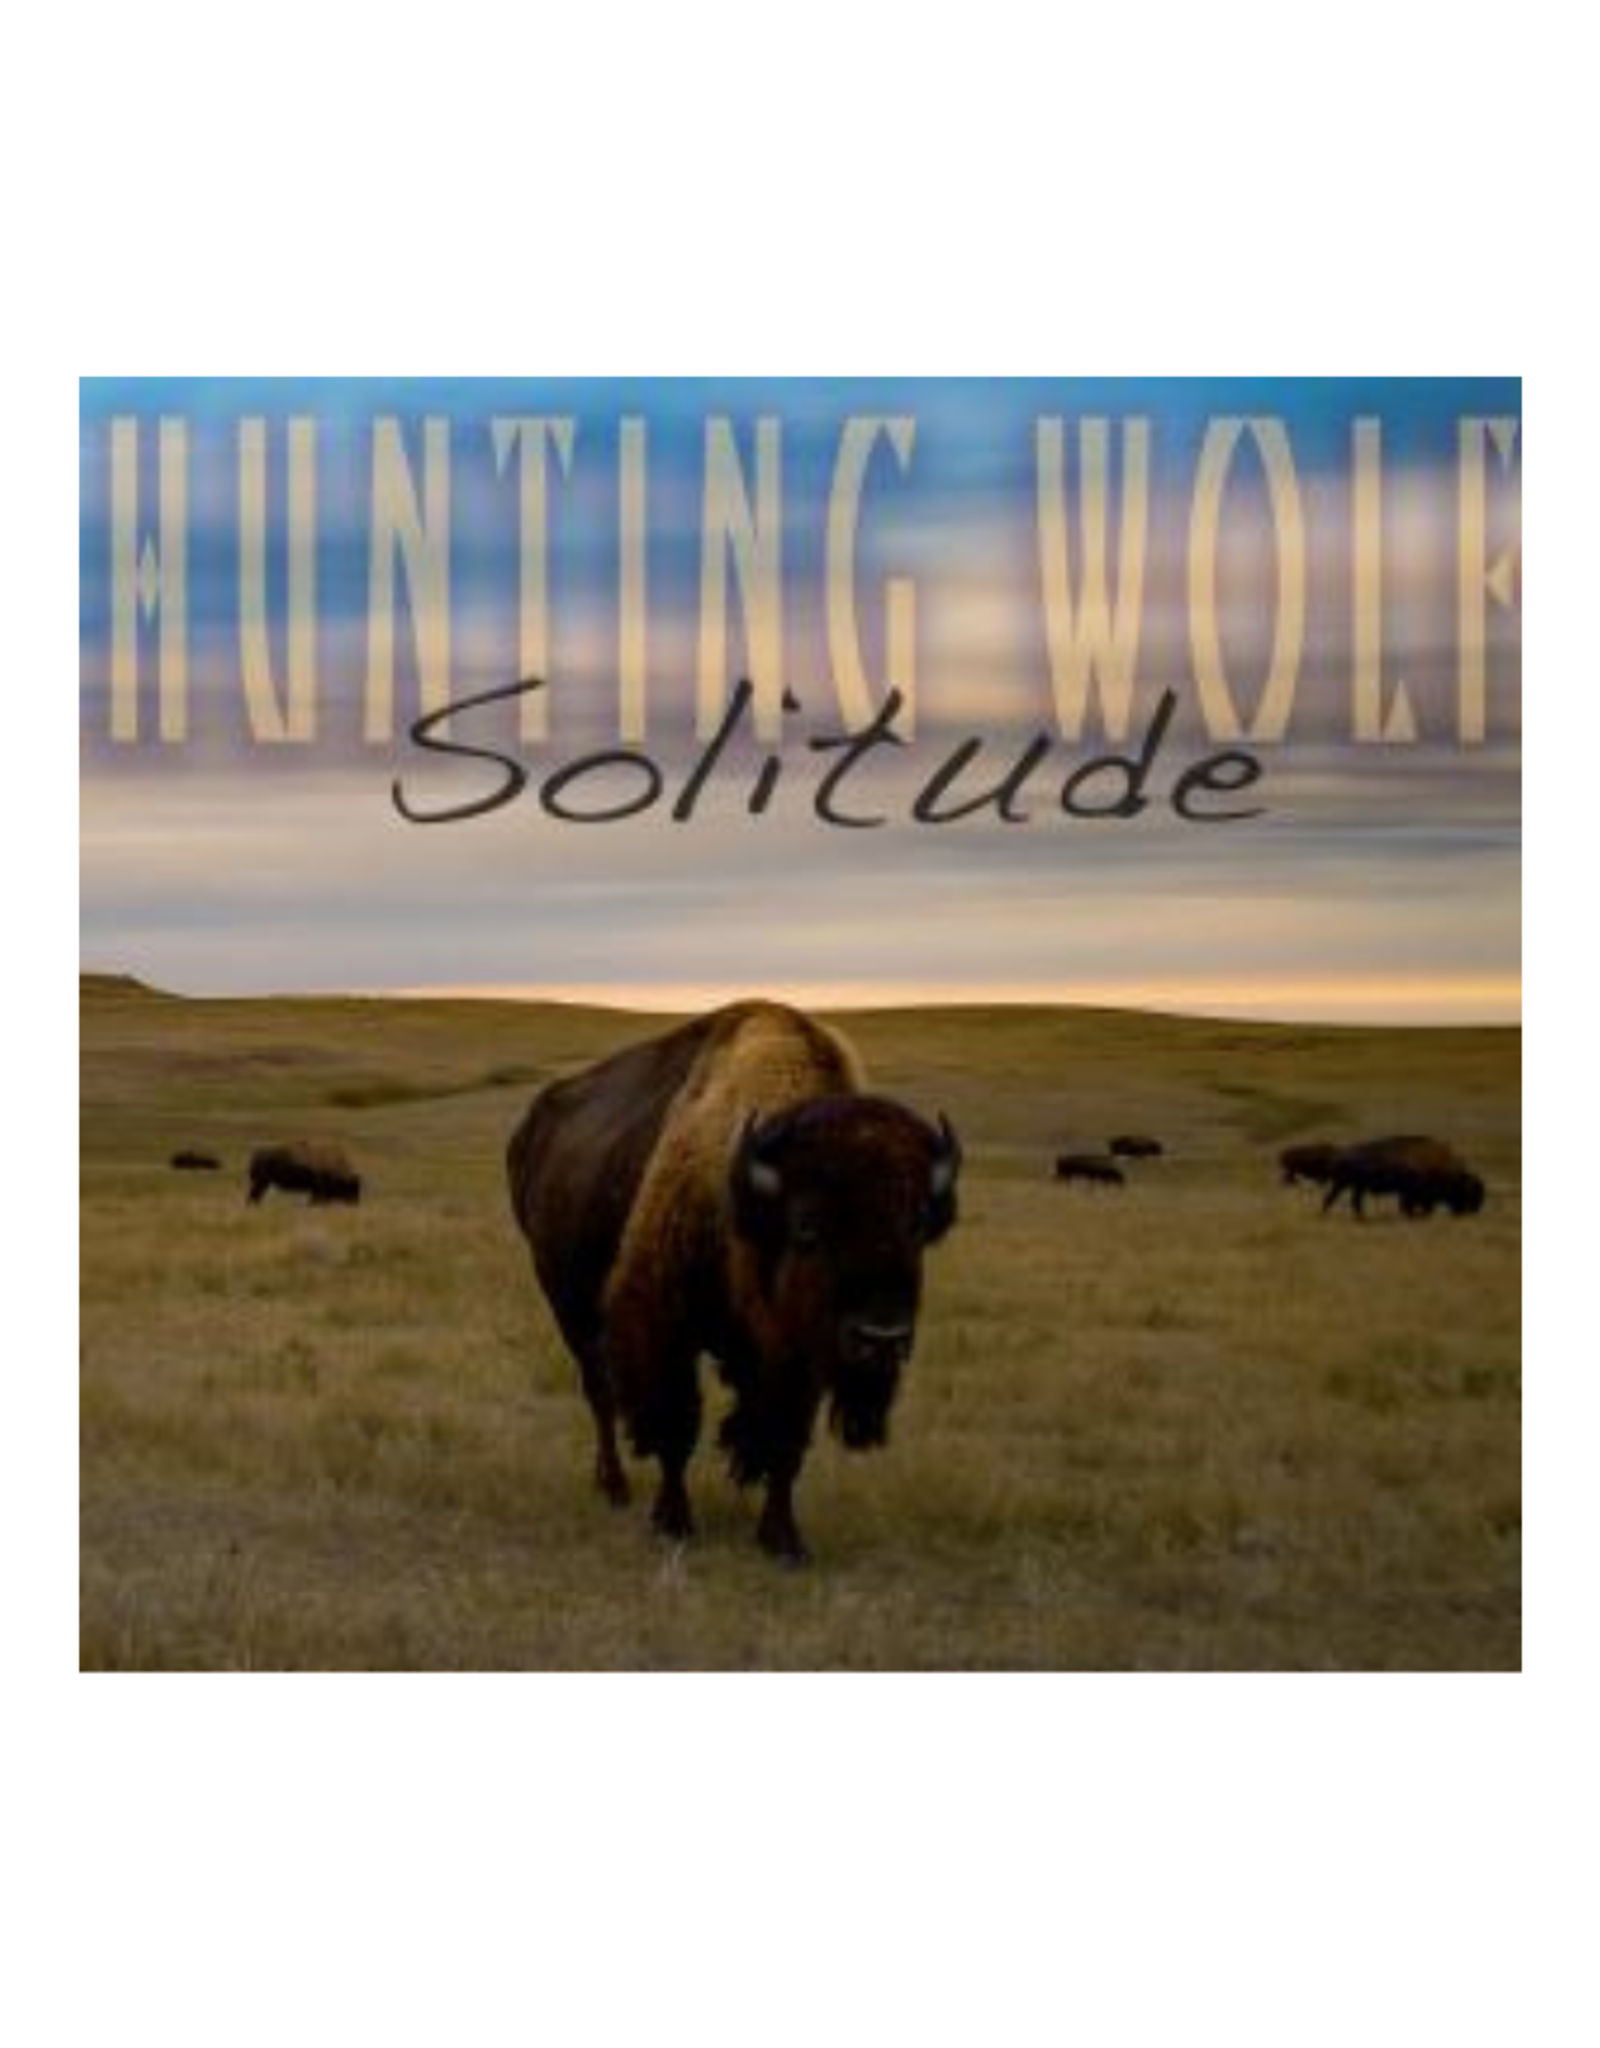 DOWNLOAD Meditationsmusik Solitude - Hunting Wolf